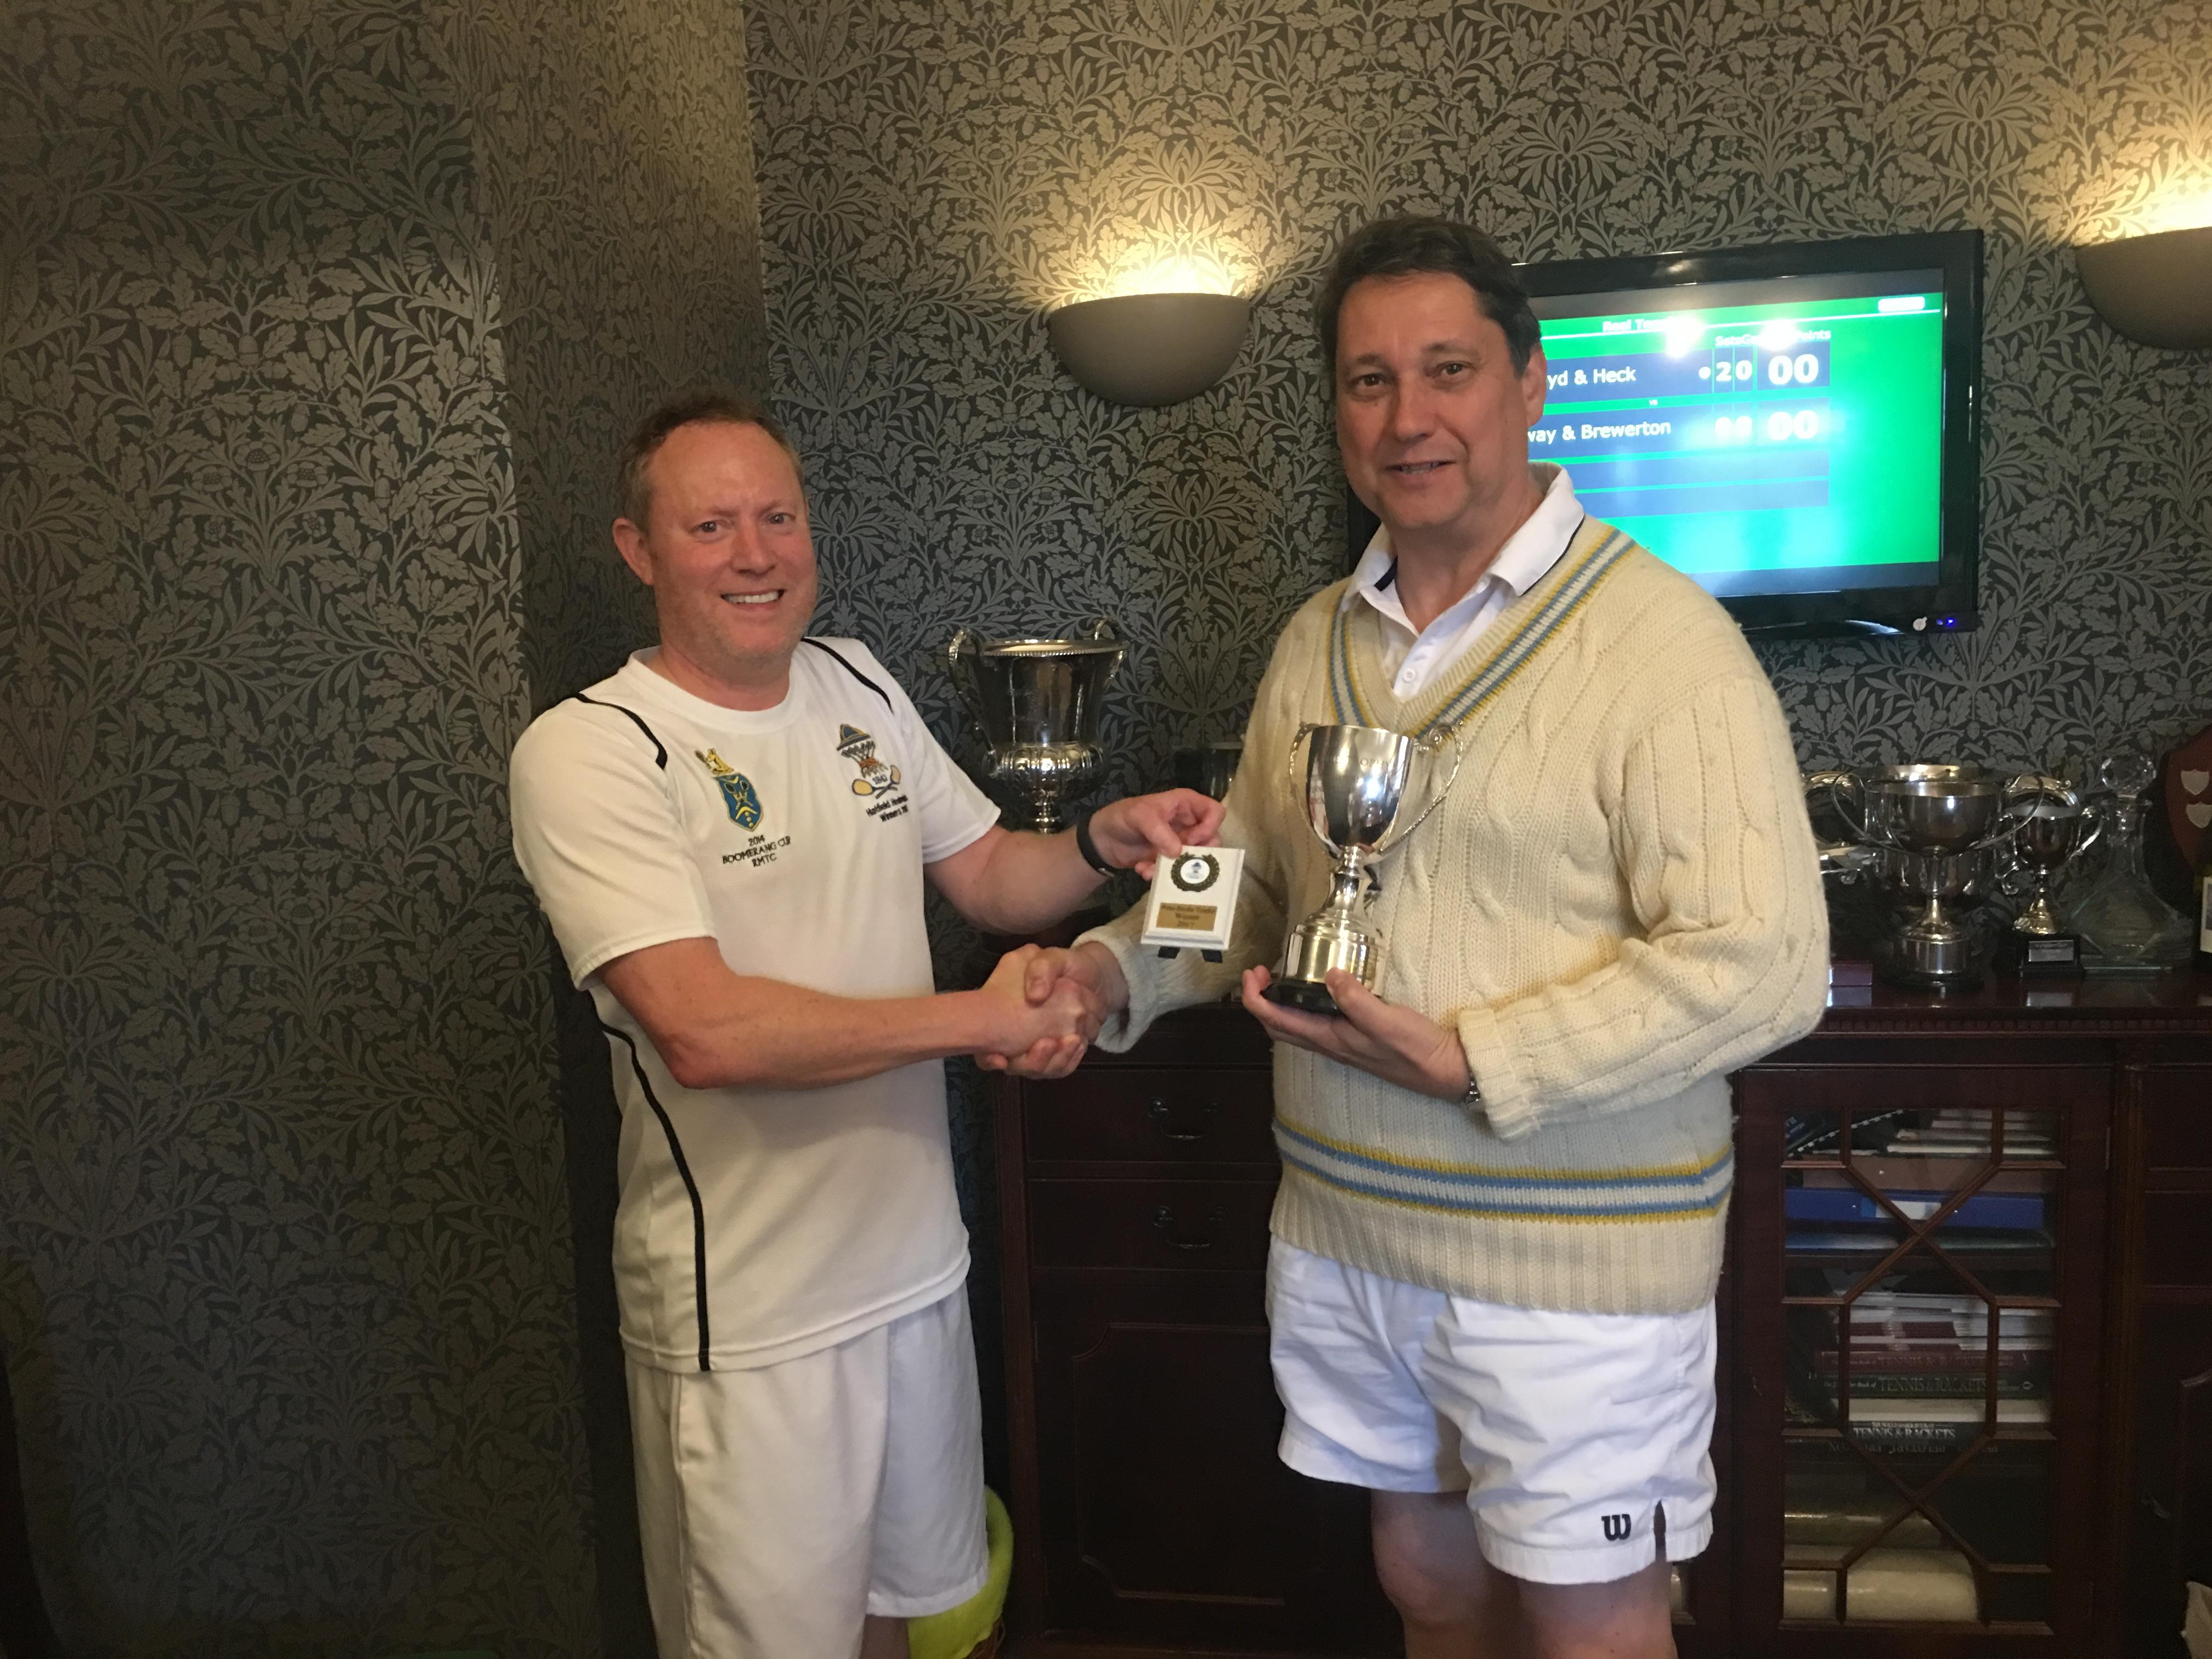 Peter Brodie Trophy 2017 - MH